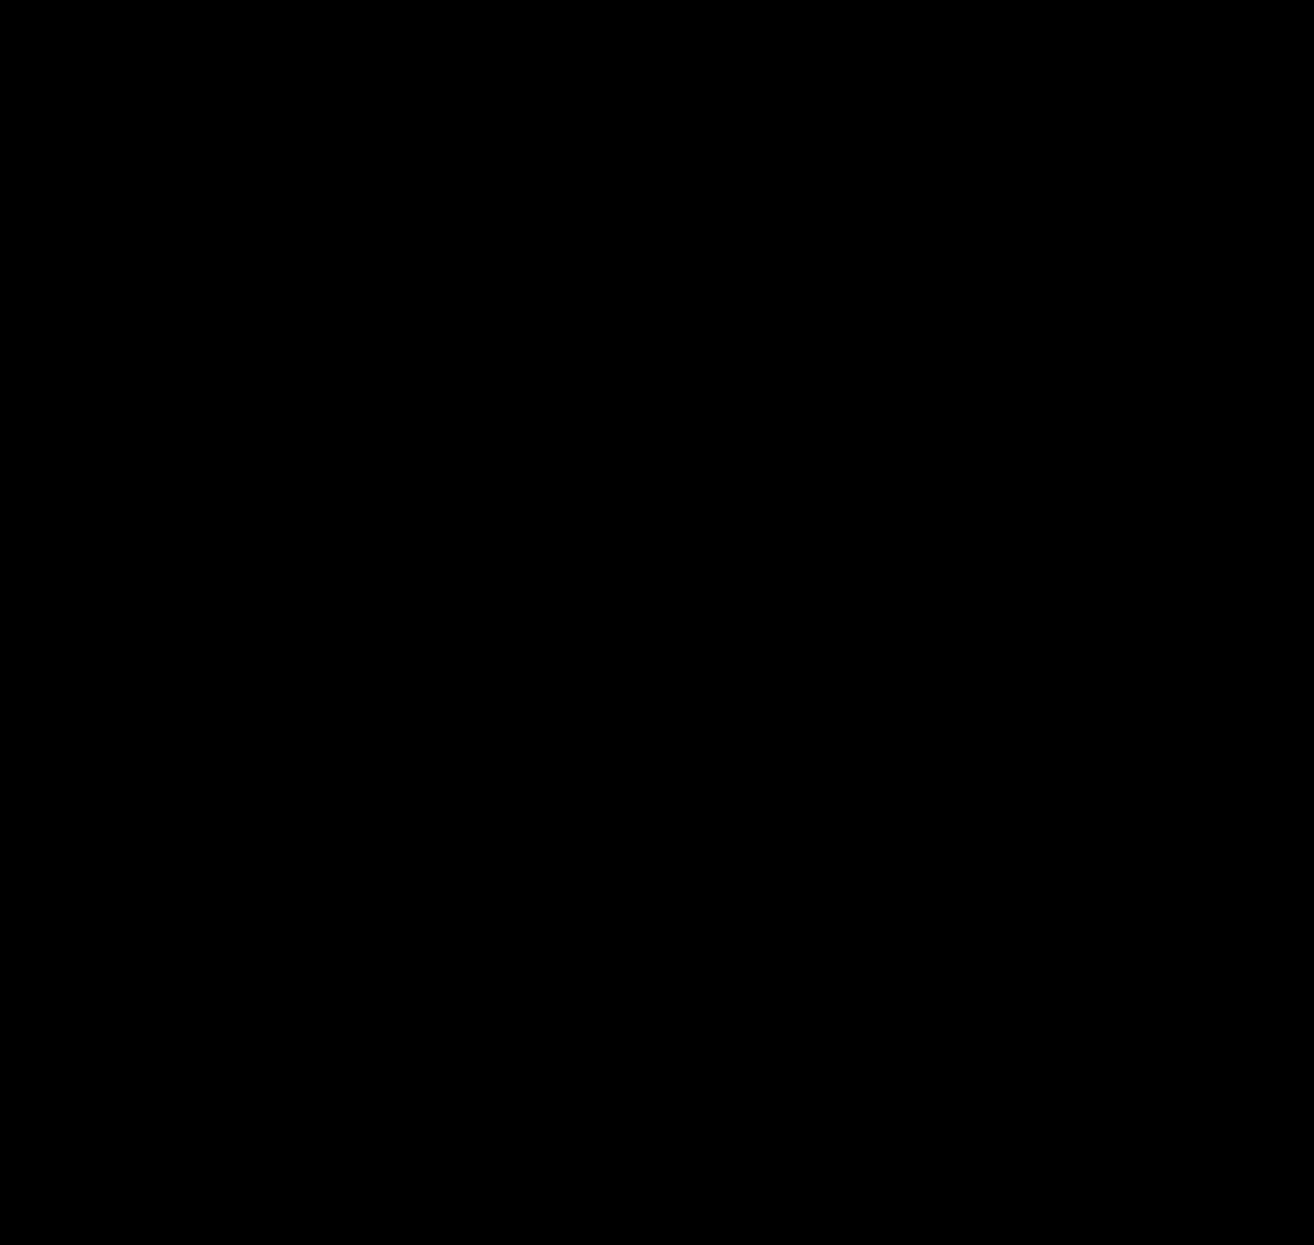 831x – 20